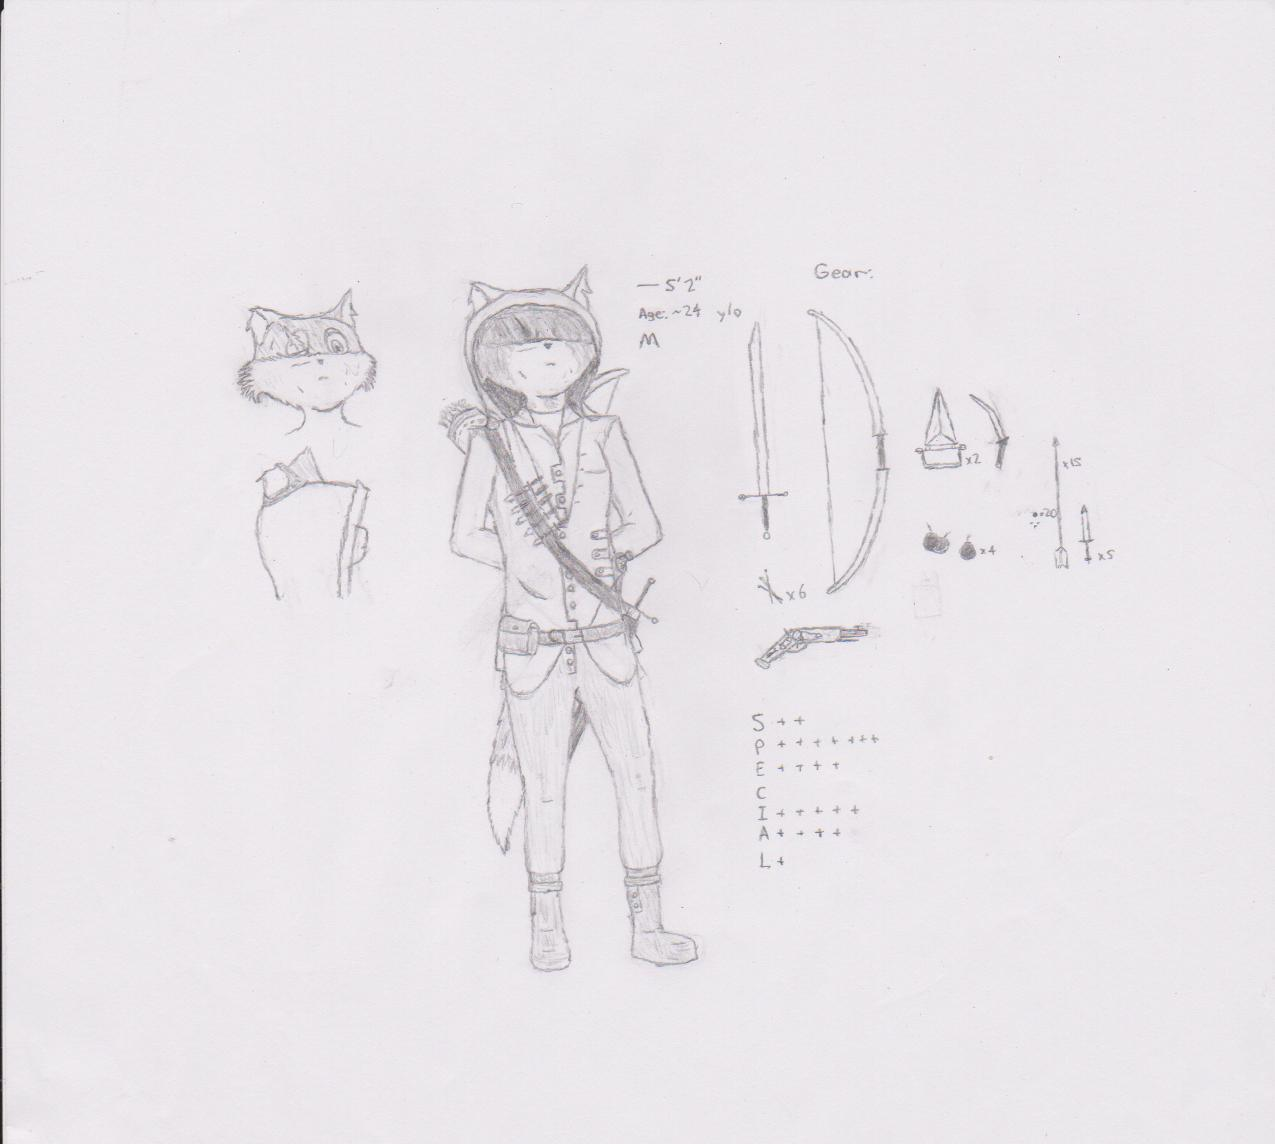 Character #1